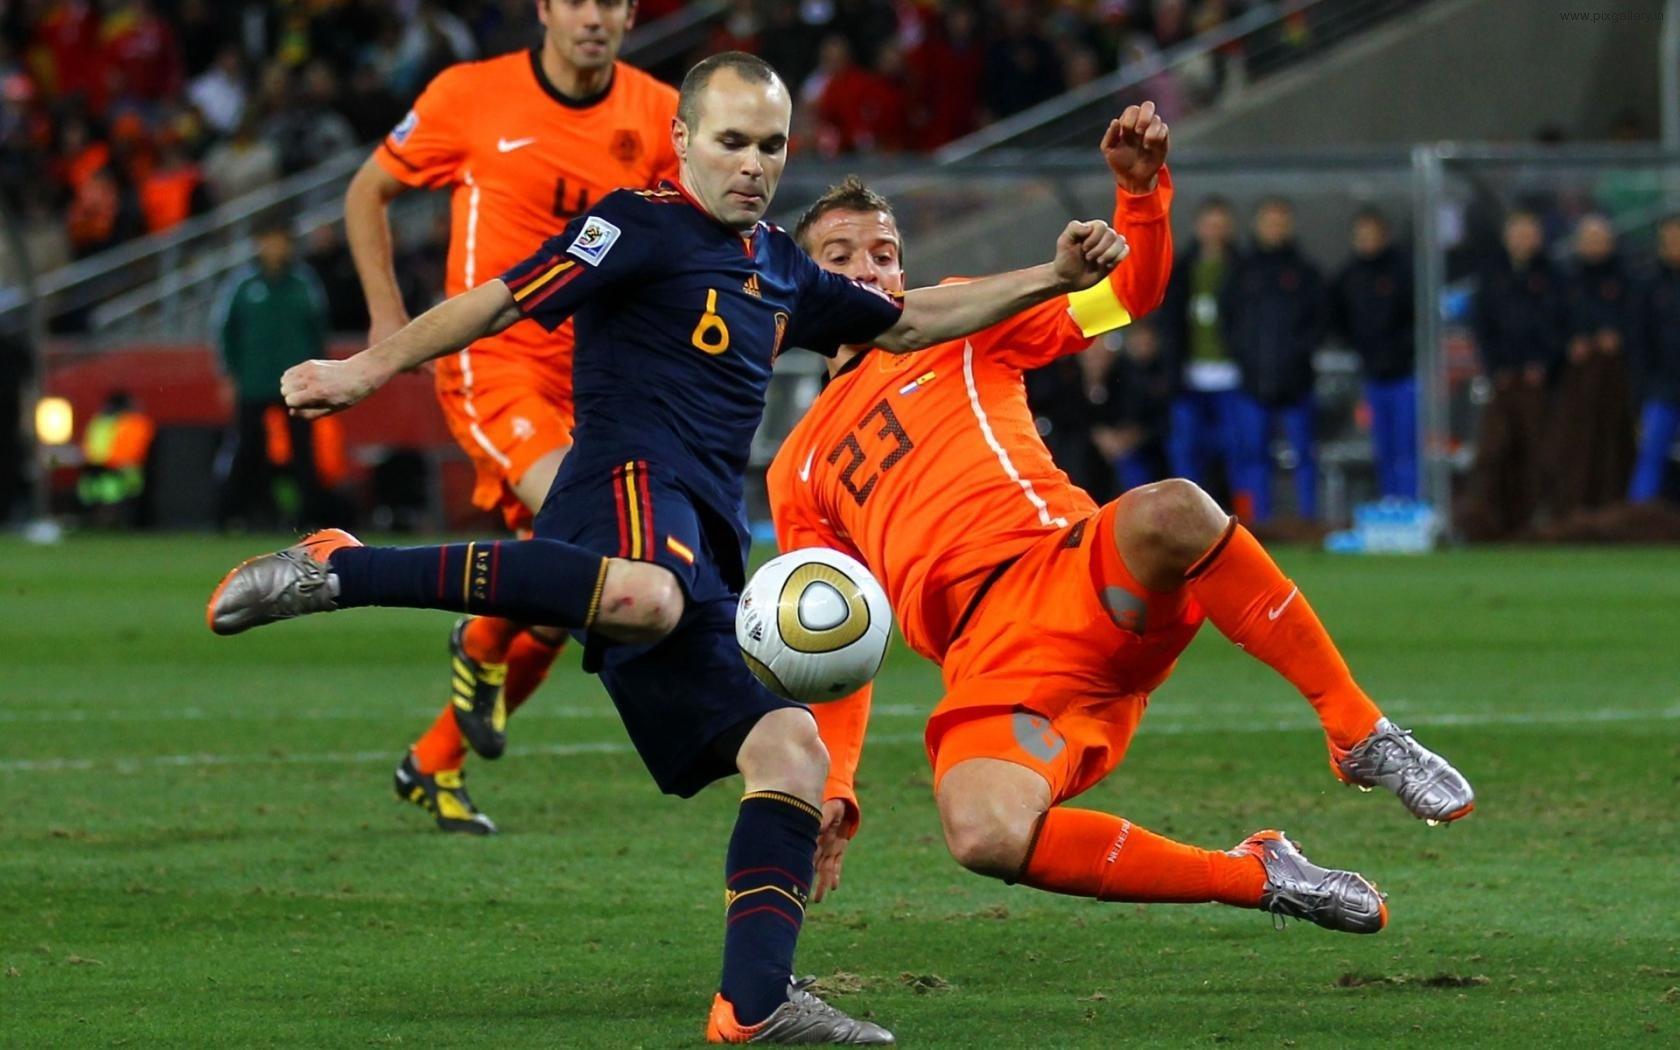 andres-iniesta-rafael-van-der-vaart-spain-holland-football-sports-world-cup-2010